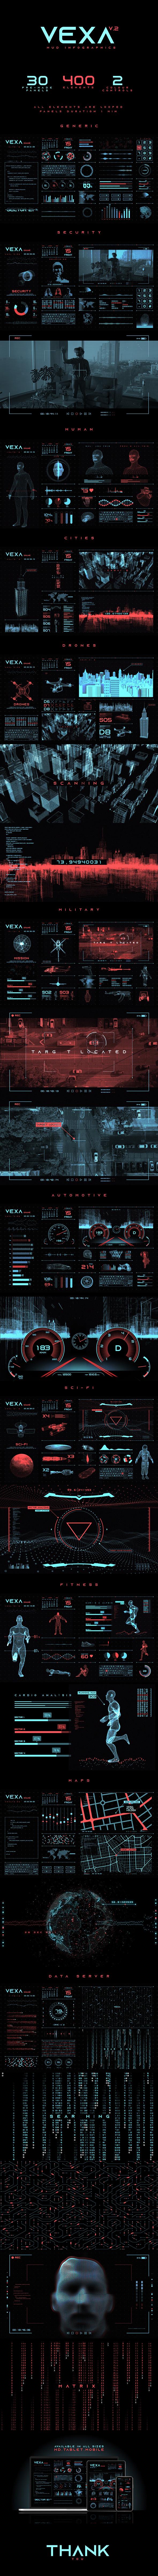 Vexa HUD Infographics - 7